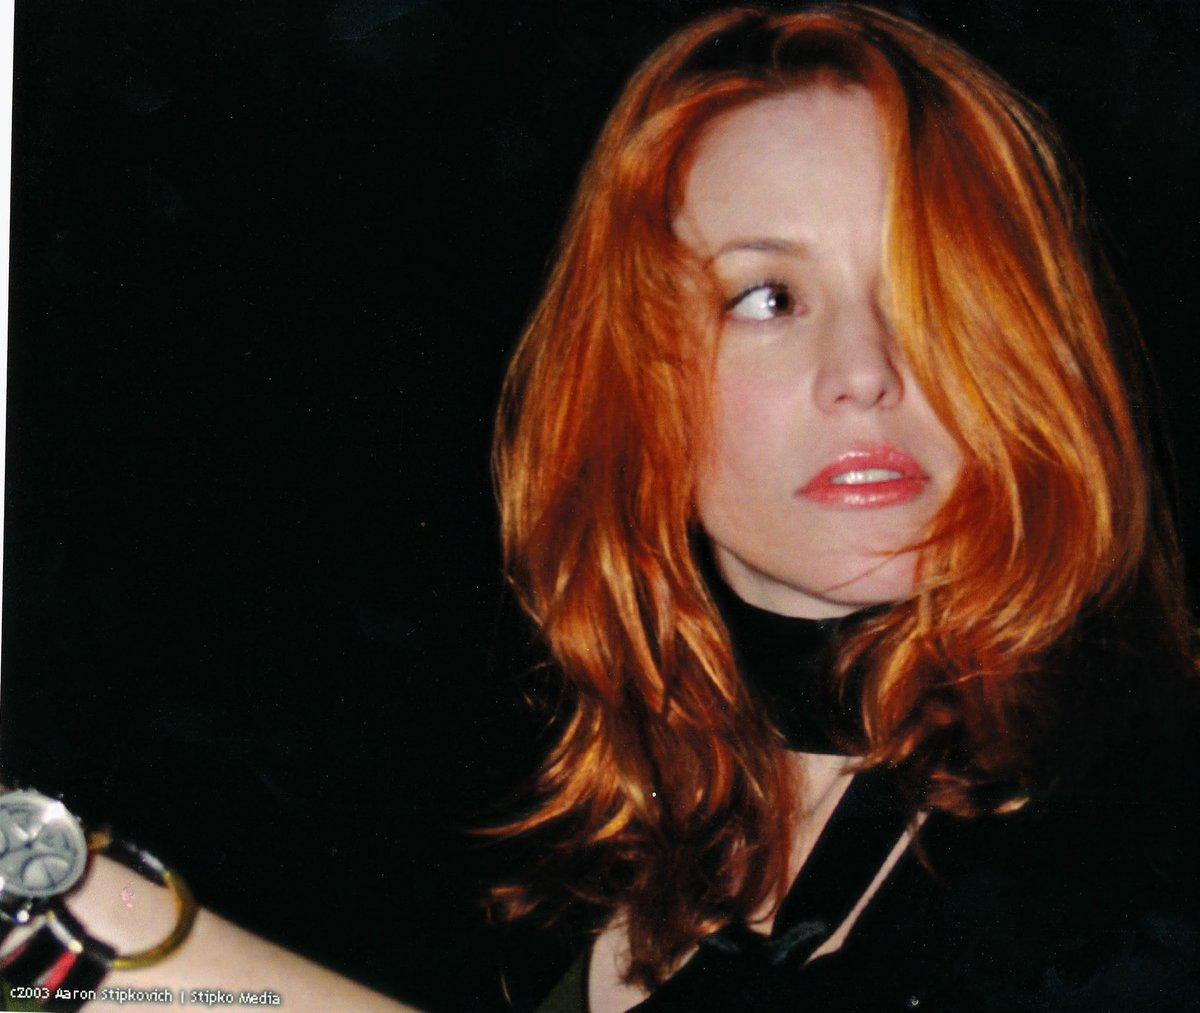 photo Kristen Dalton (actress)